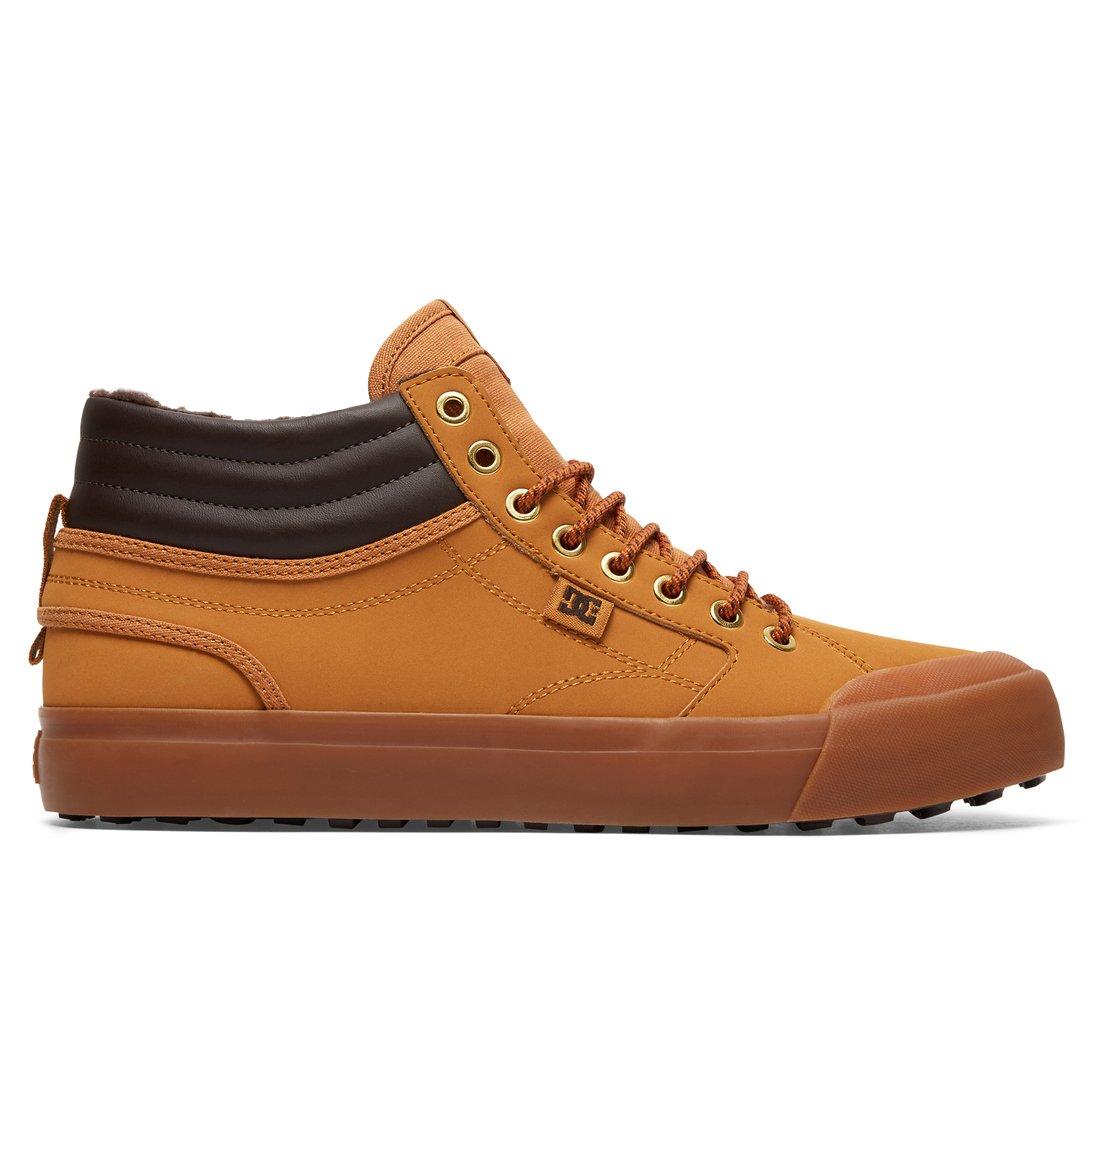 DC Shoes Evan Smith Hi WNT Zapatillas Hombre, Marrón (Wheat), 43 EU (9 UK)